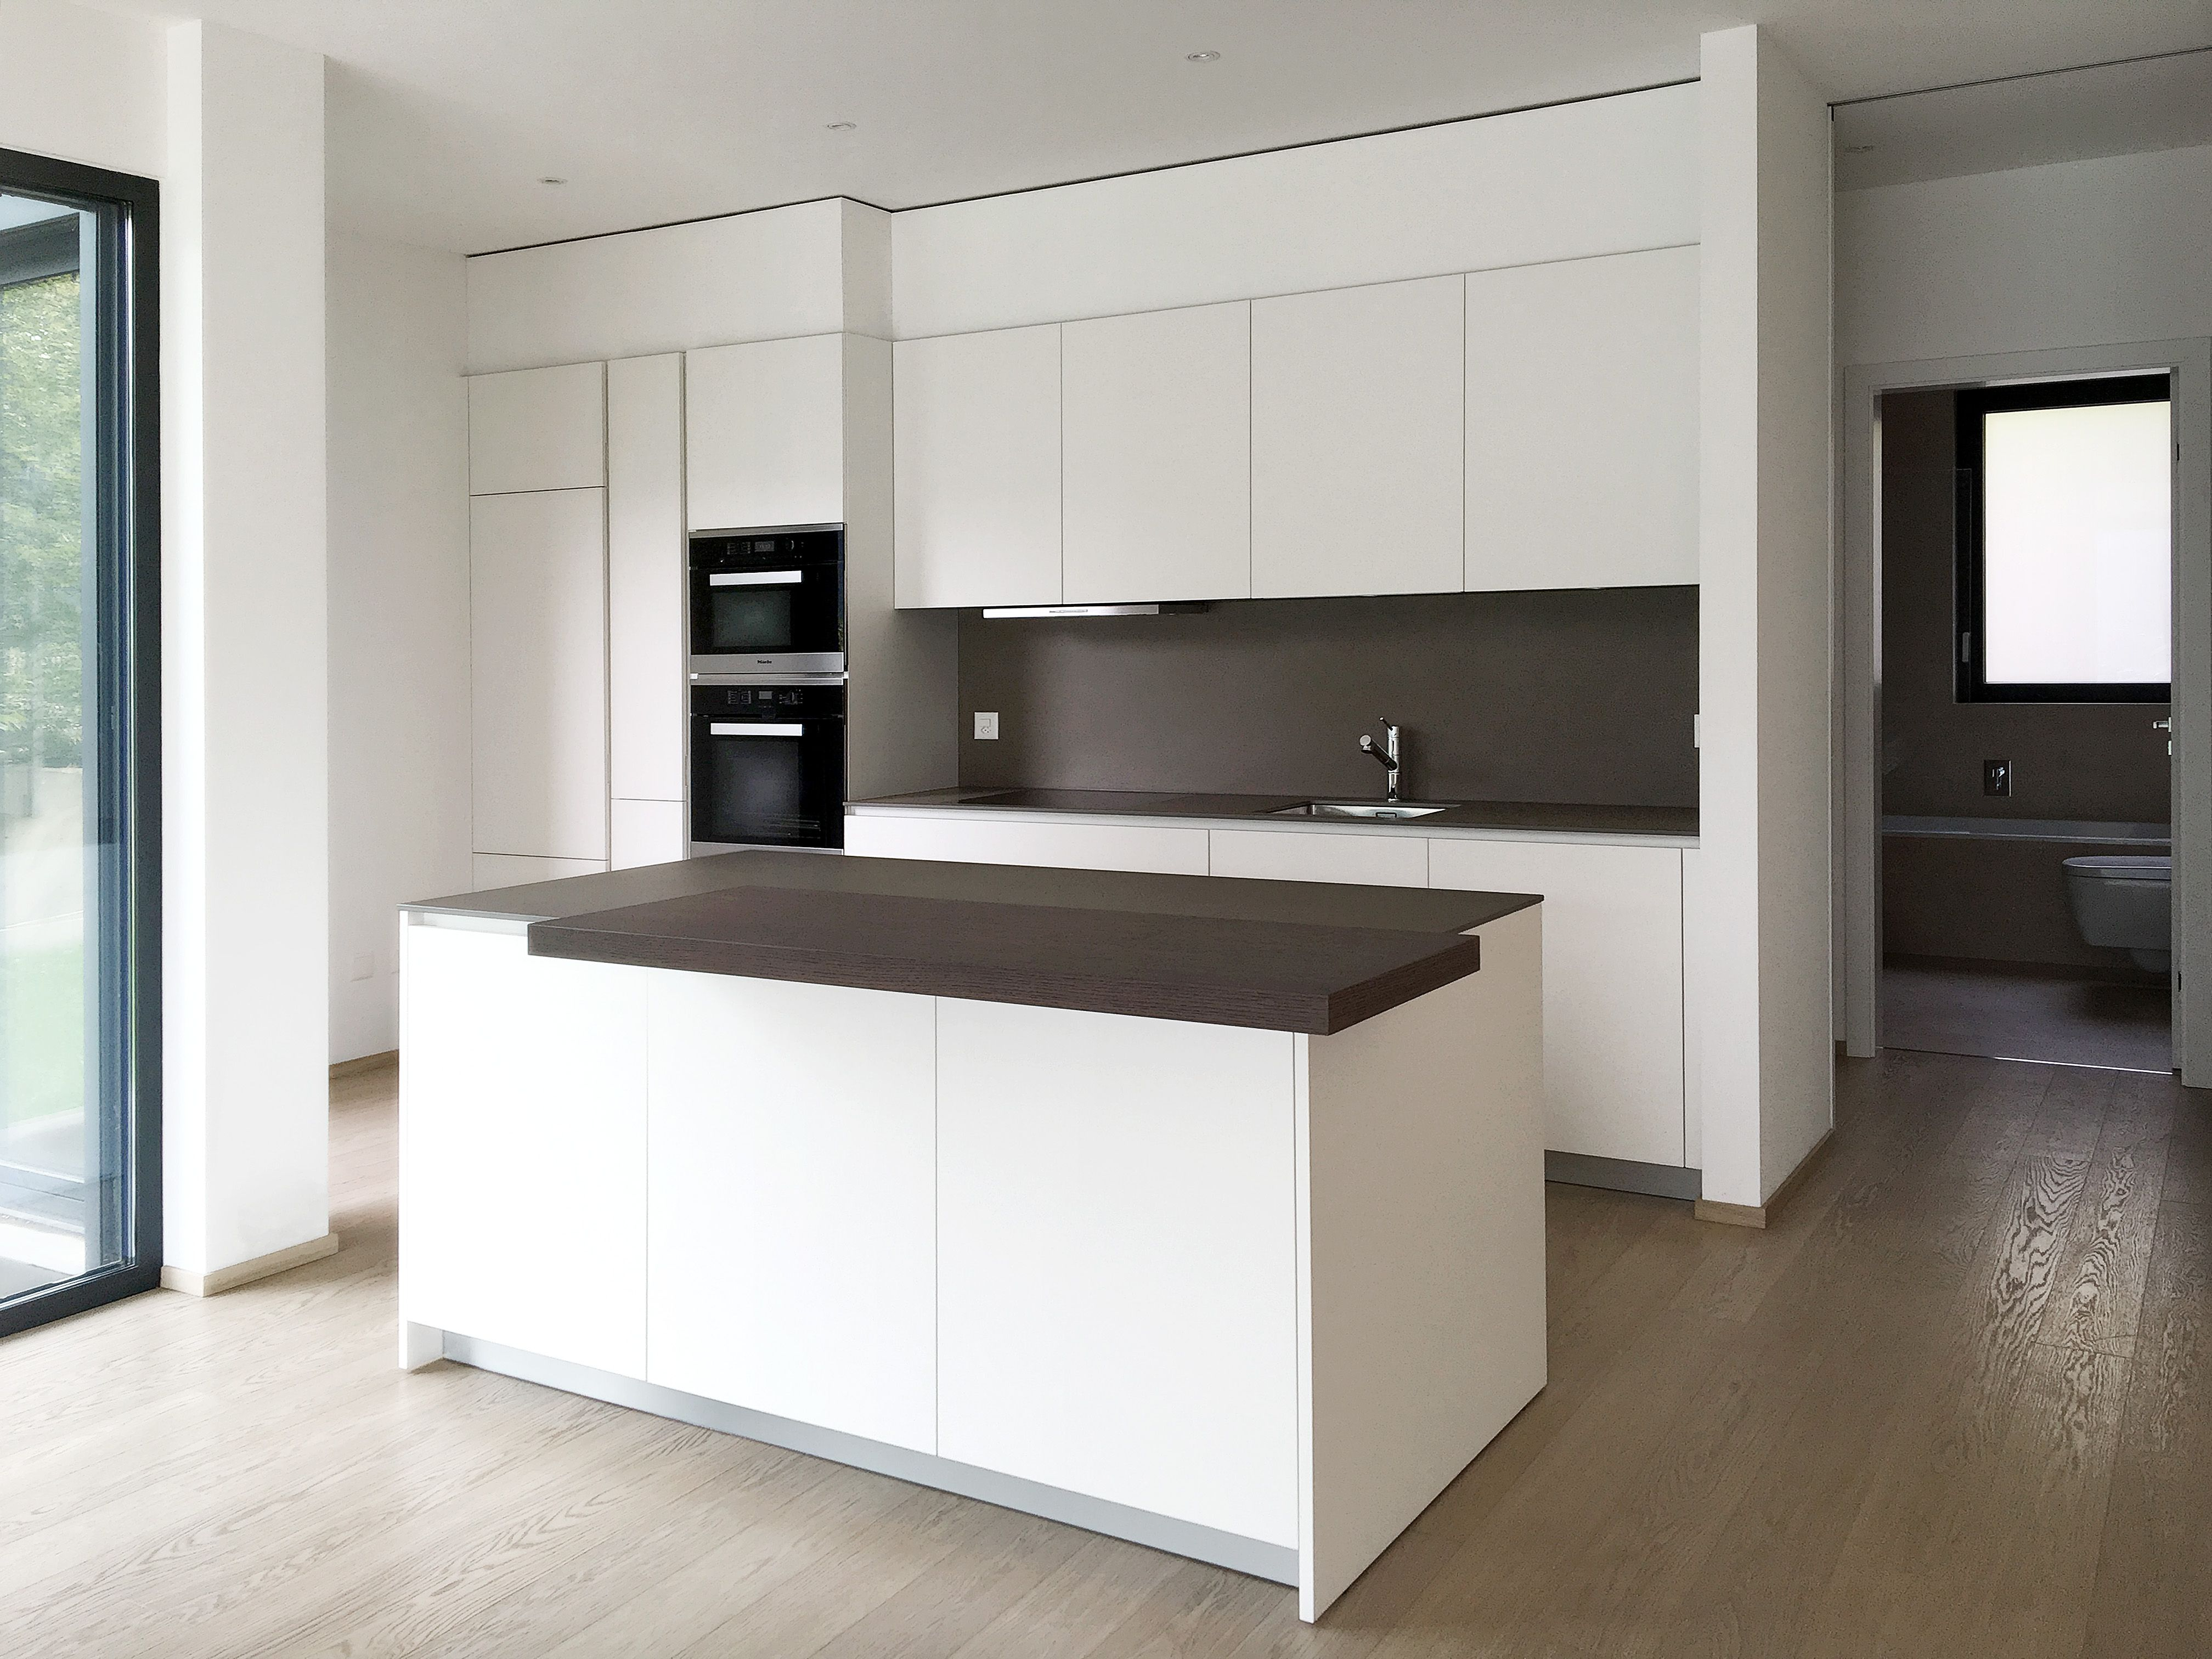 Cucina design Varenna Poliform laccata bianca con piano in ceramica Cucine Varenna canton